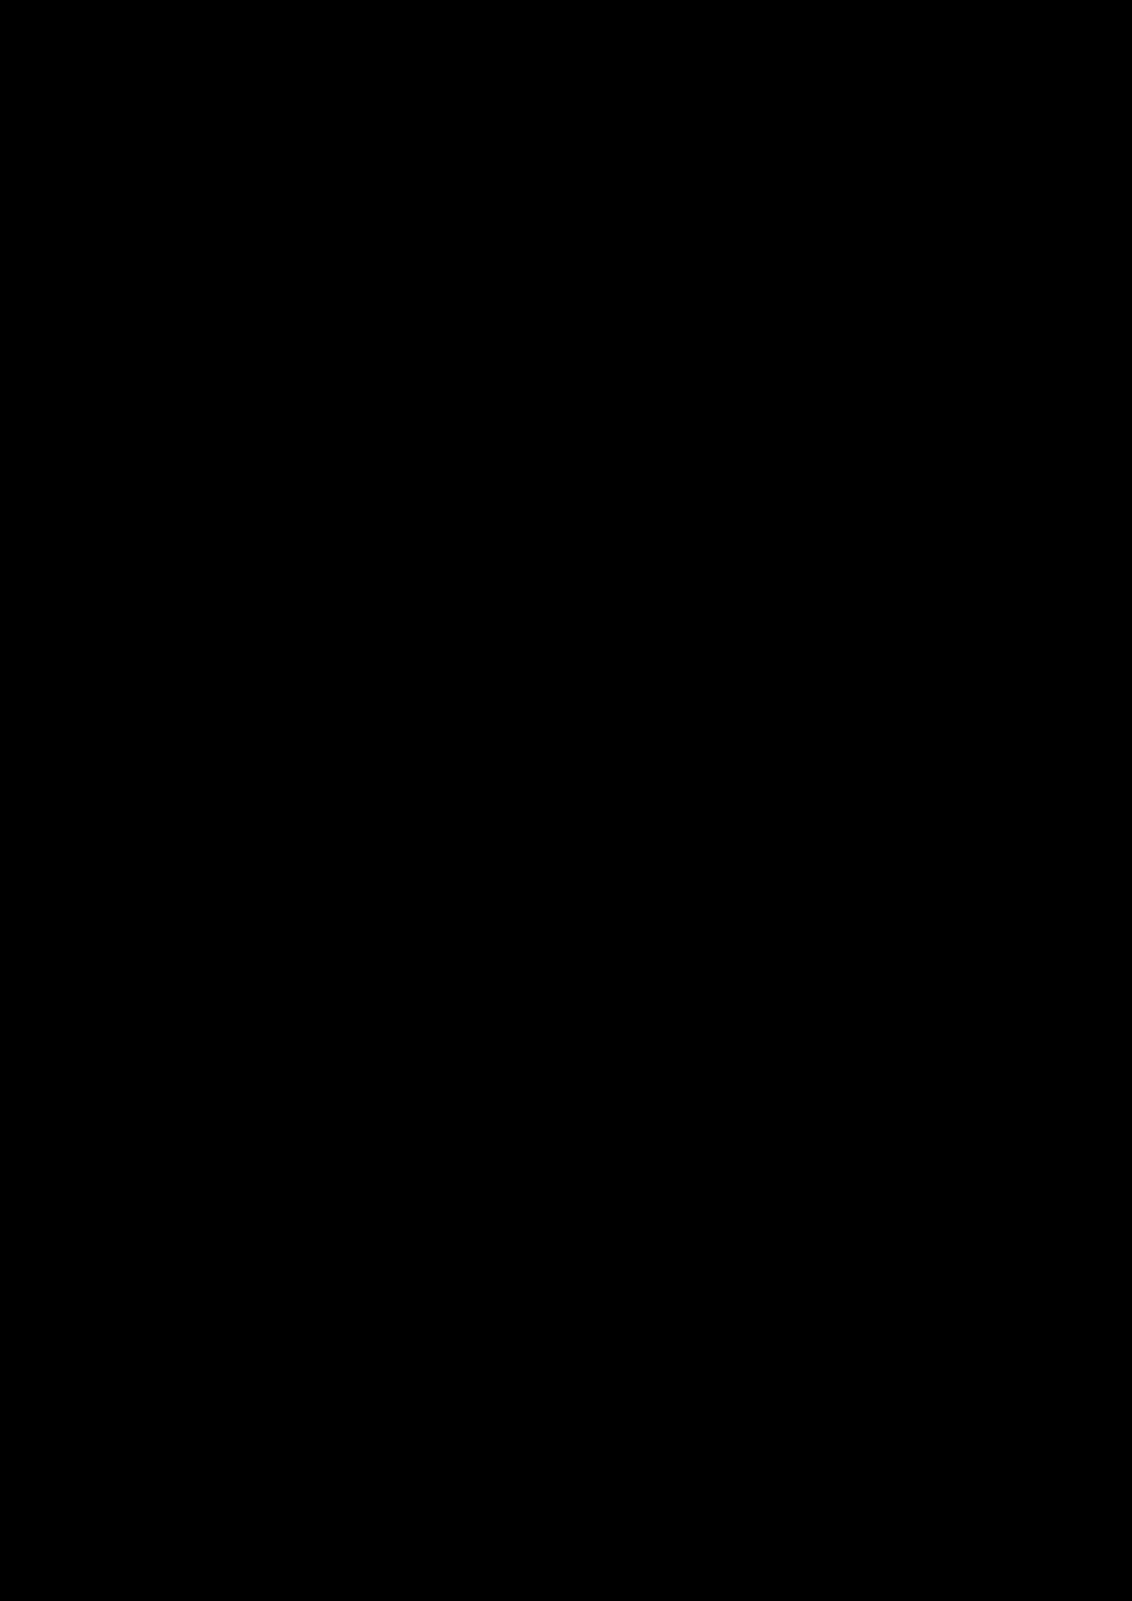 Ispoved Pervogo Boga slide, Image 32